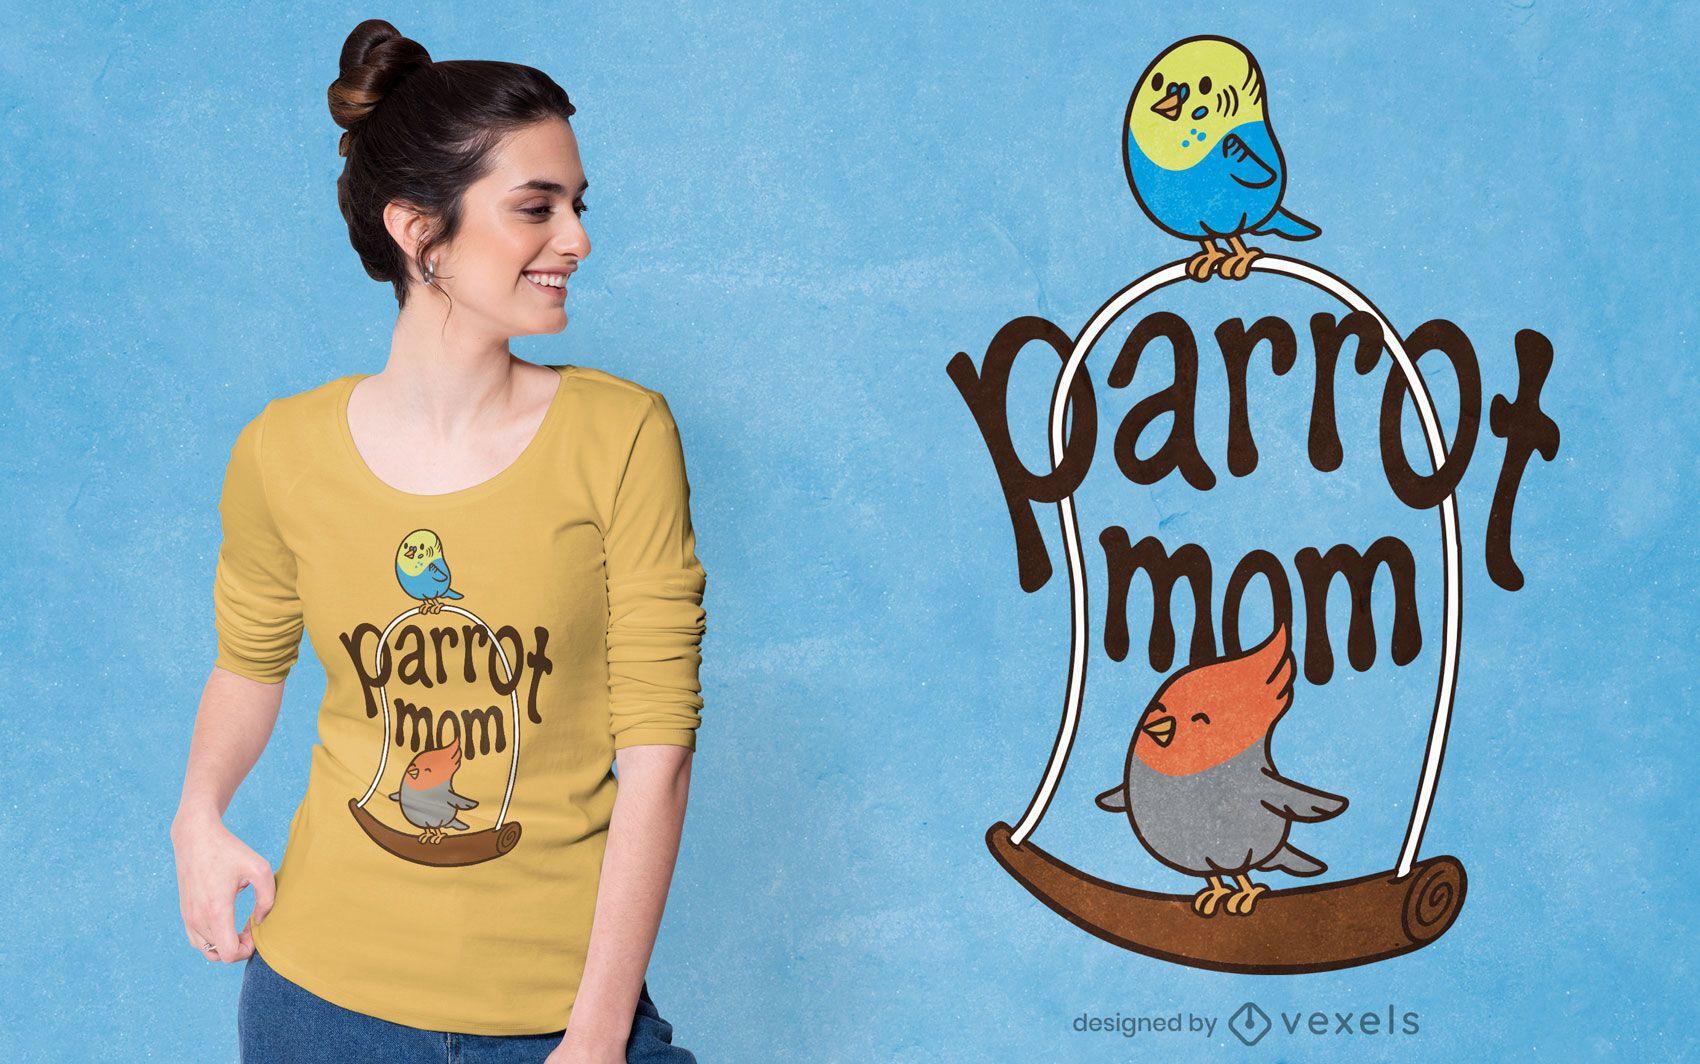 Parrot mom t-shirt design